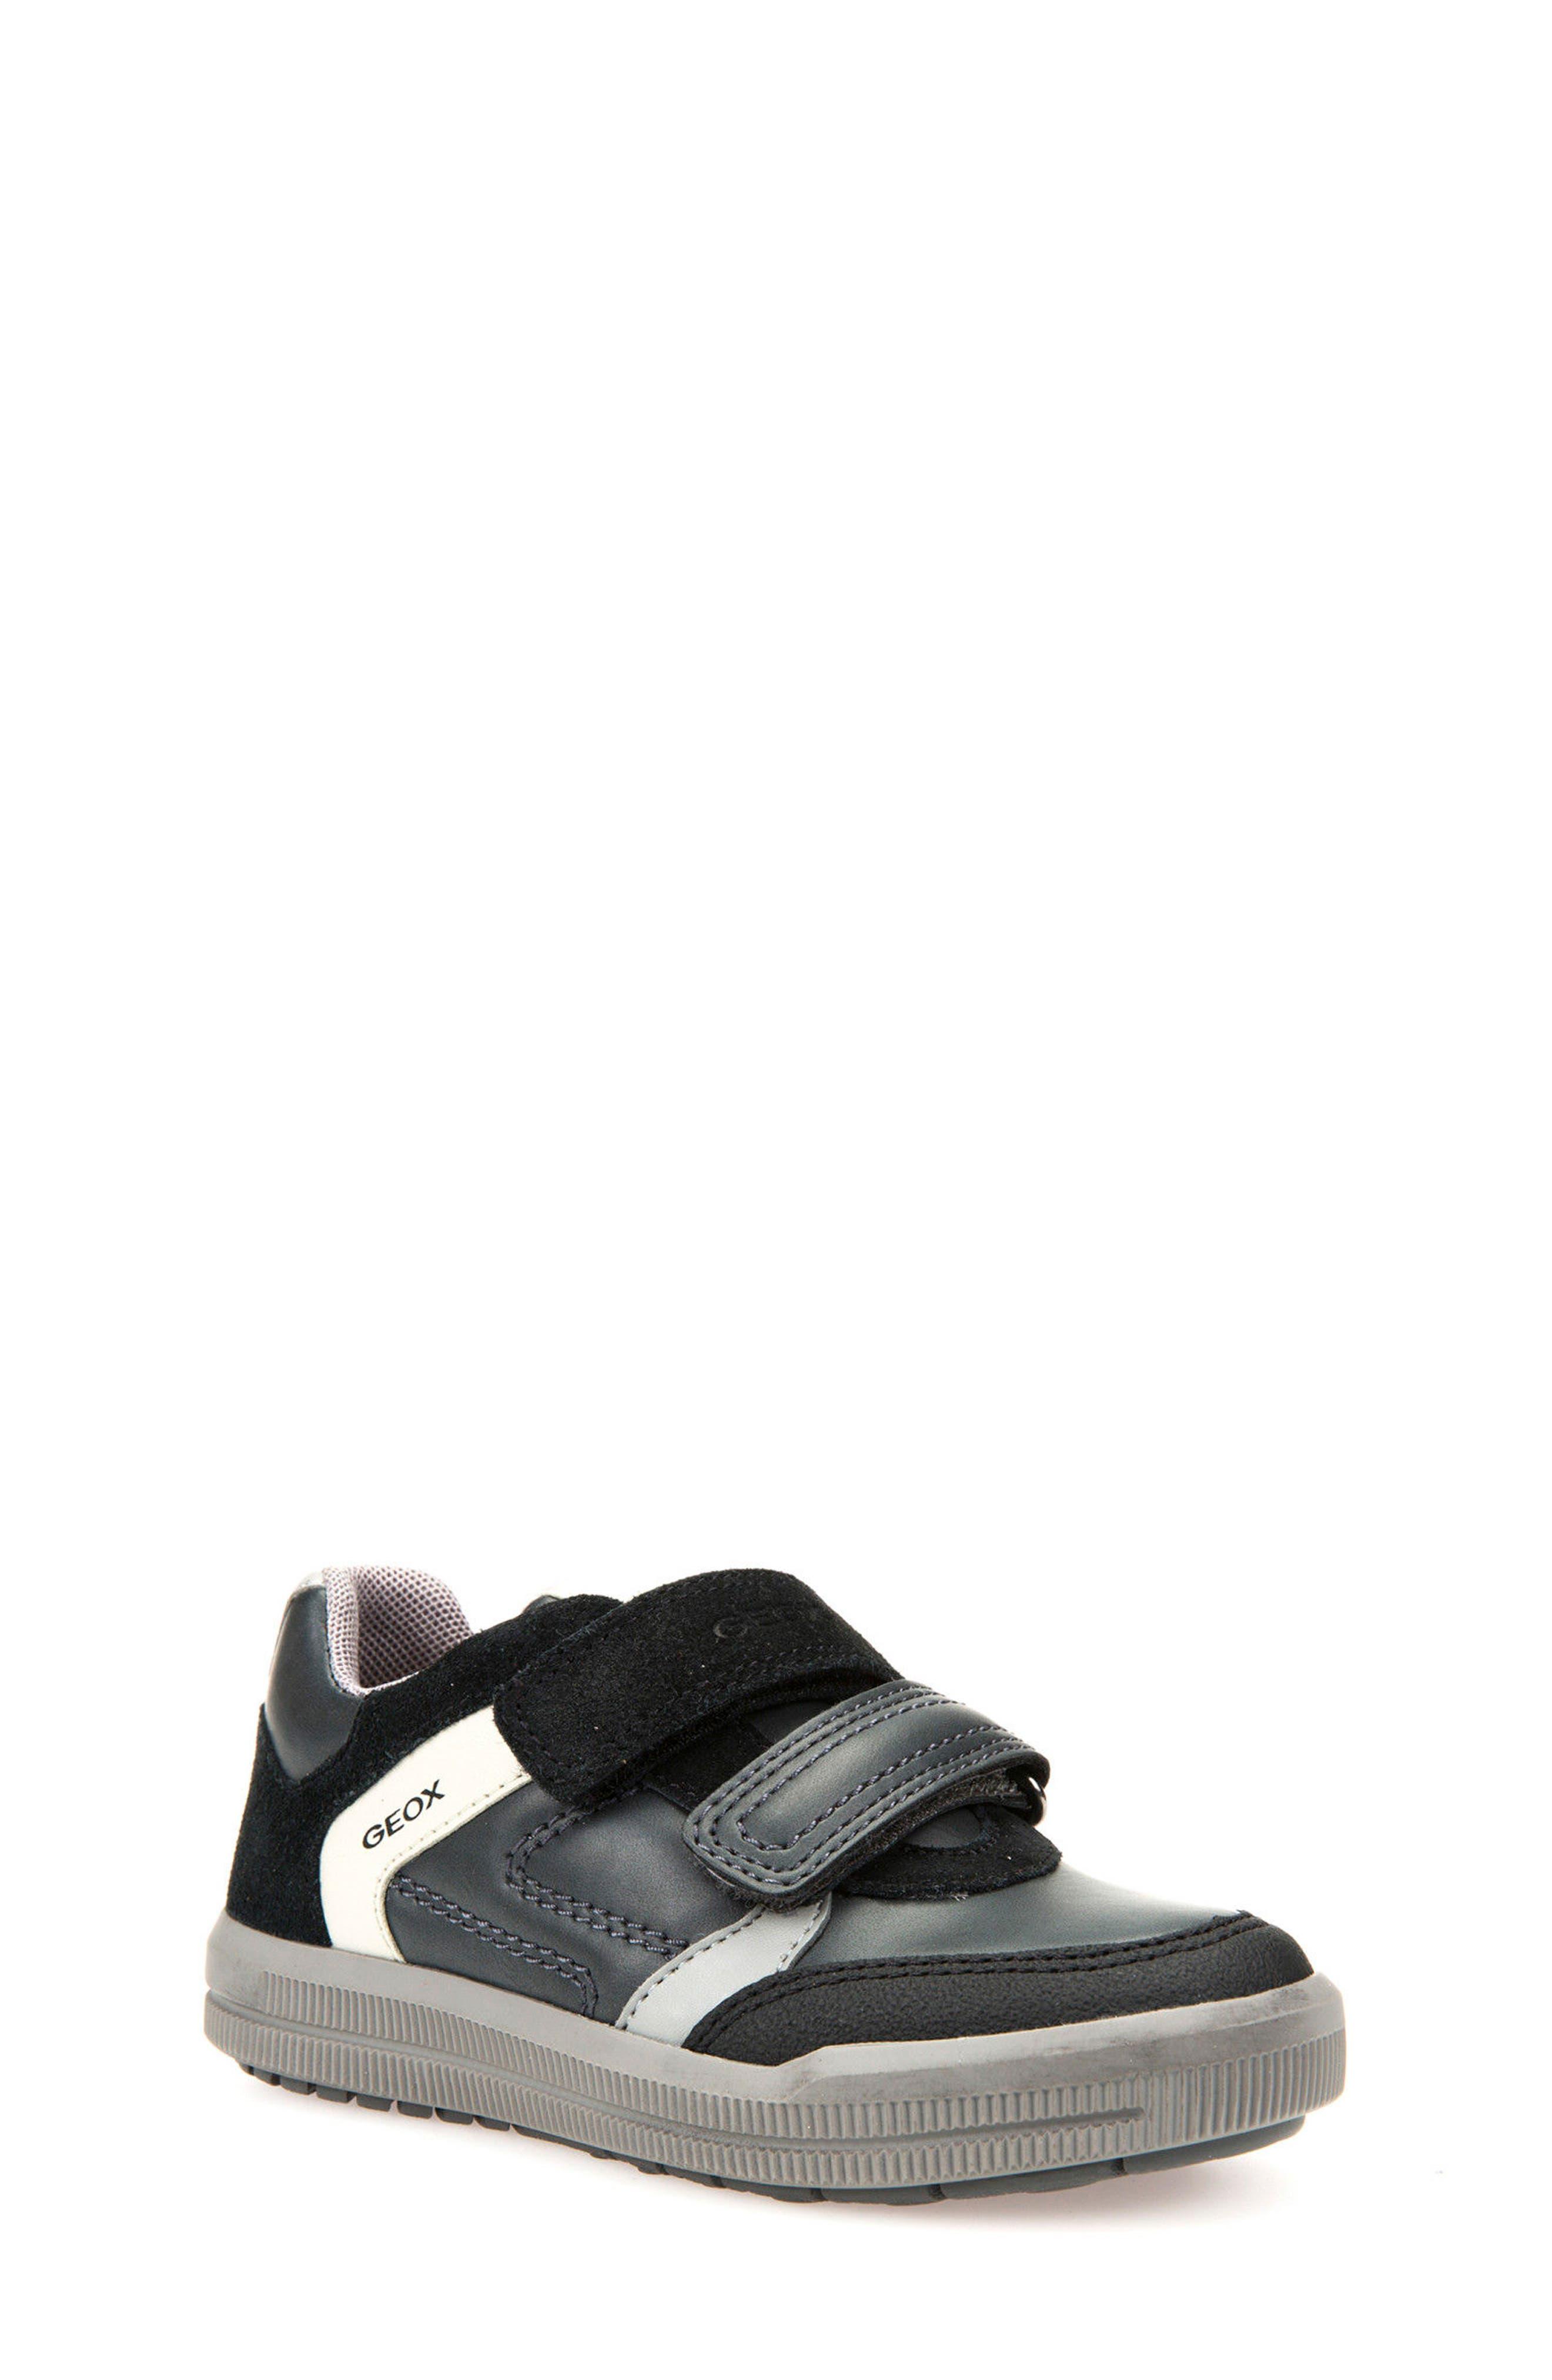 Alternate Image 1 Selected - Geox Jr Arzach Sneaker (Toddler, Little Kid & Big Kid)